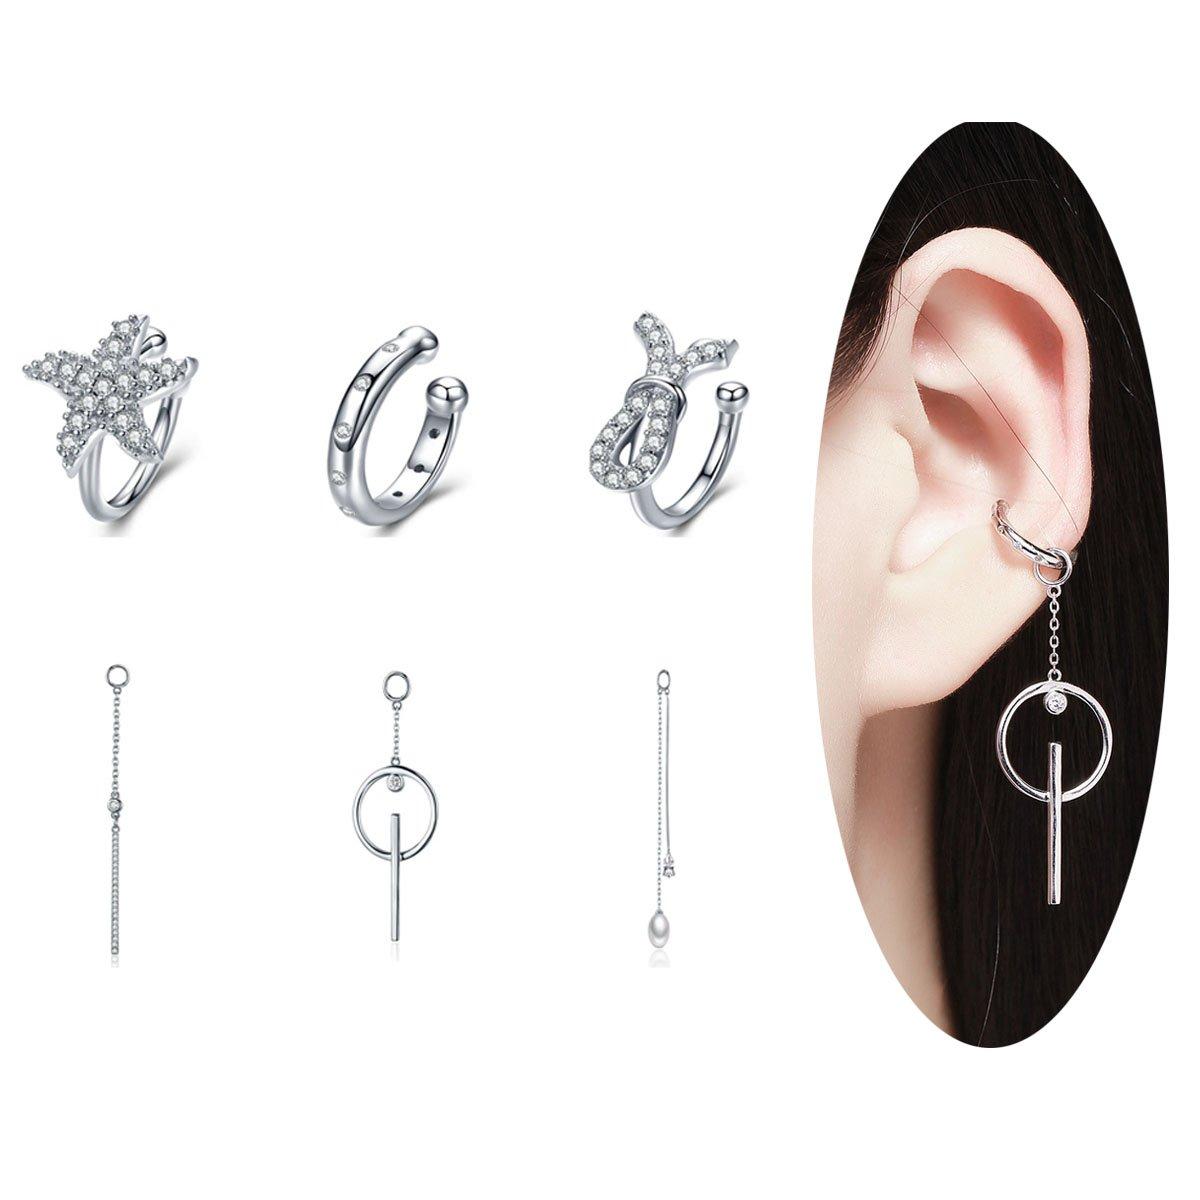 2d186e399 Amazon.com: BAMOER 925 Sterling Silver DIY Ear Cuff Cartilage Earrings Set  for Women White Gold Plated Fashion Wrap Earrings (Bow Cuff): Jewelry